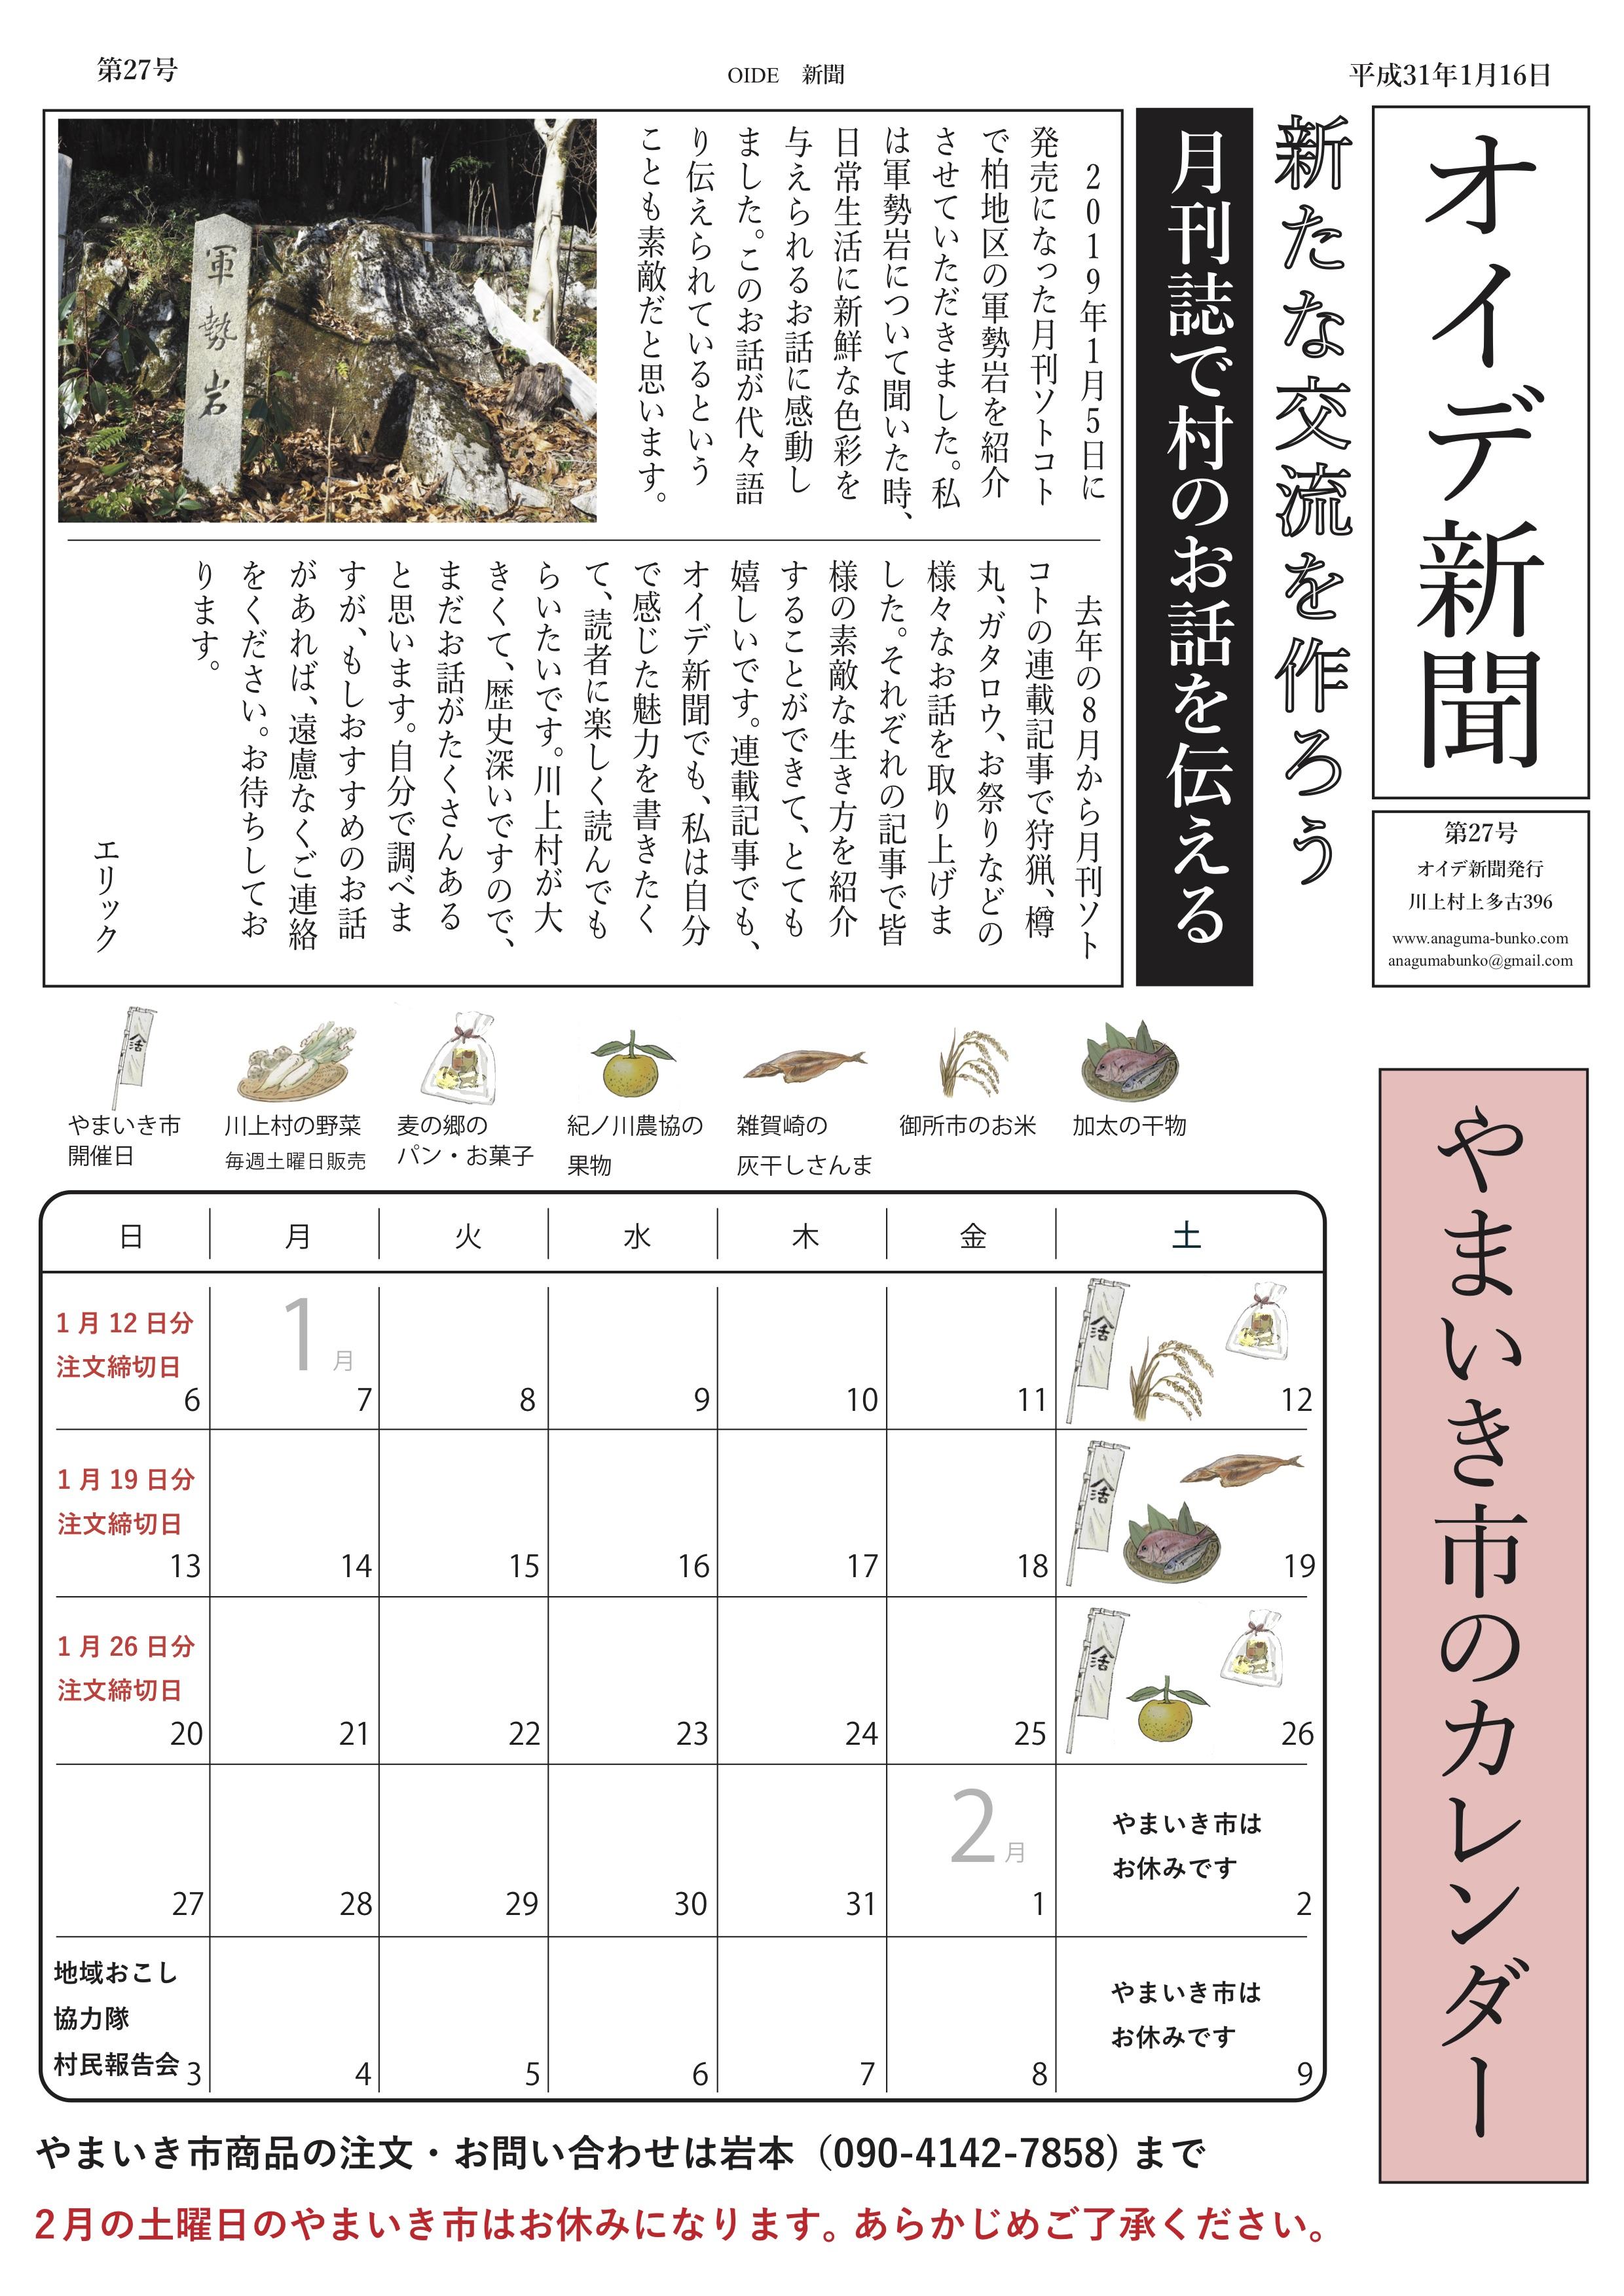 oide新聞31年1月号表.jpg